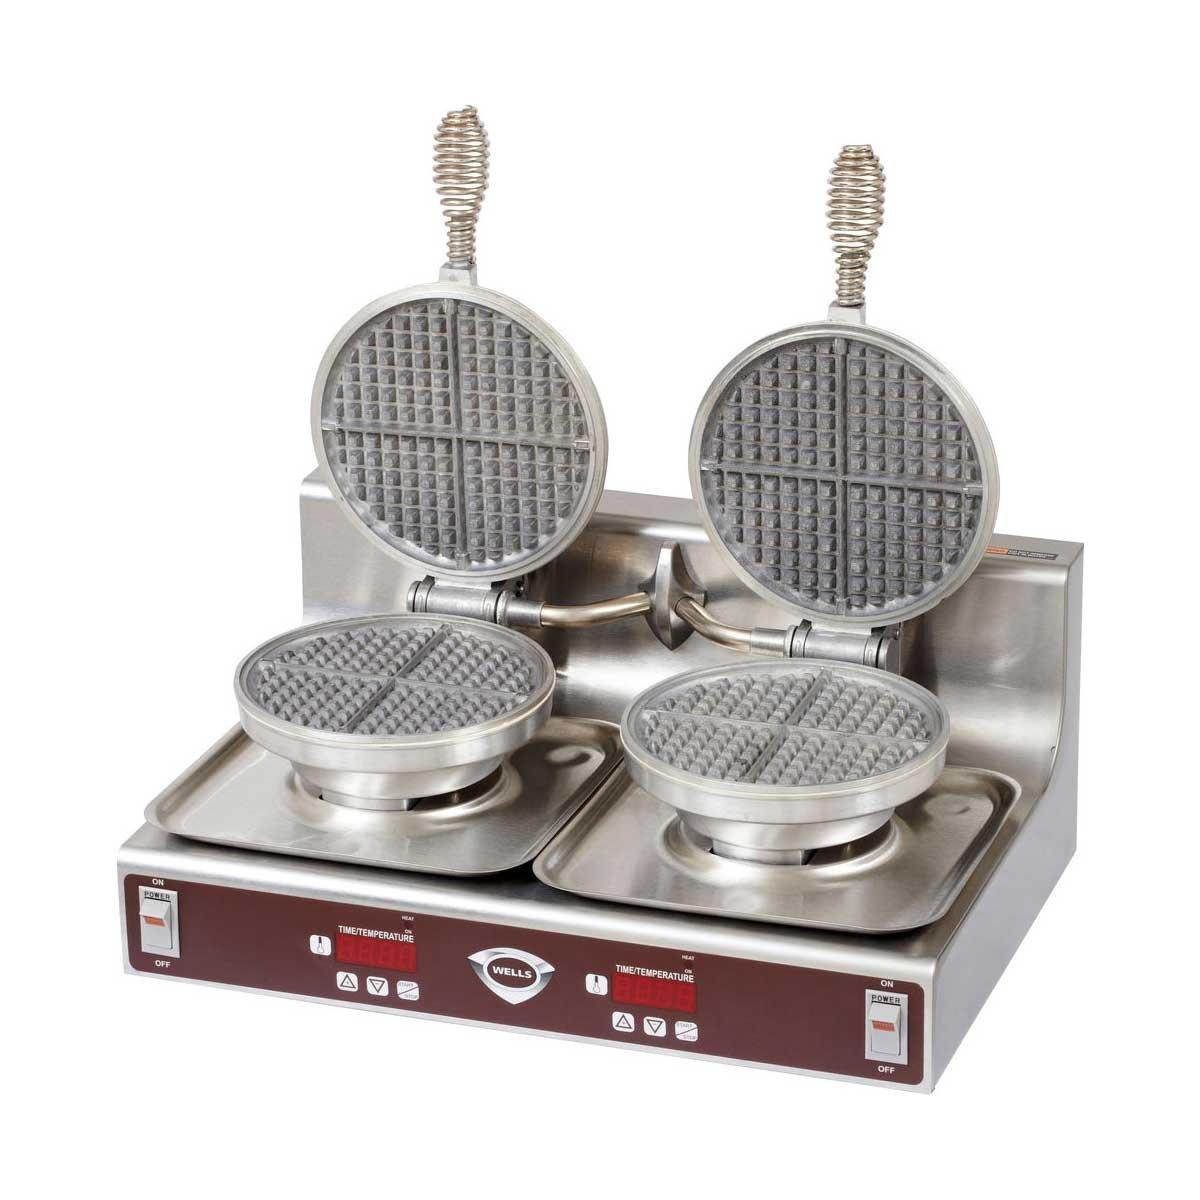 120v Wells WB-2E Double Round Waffle Baker